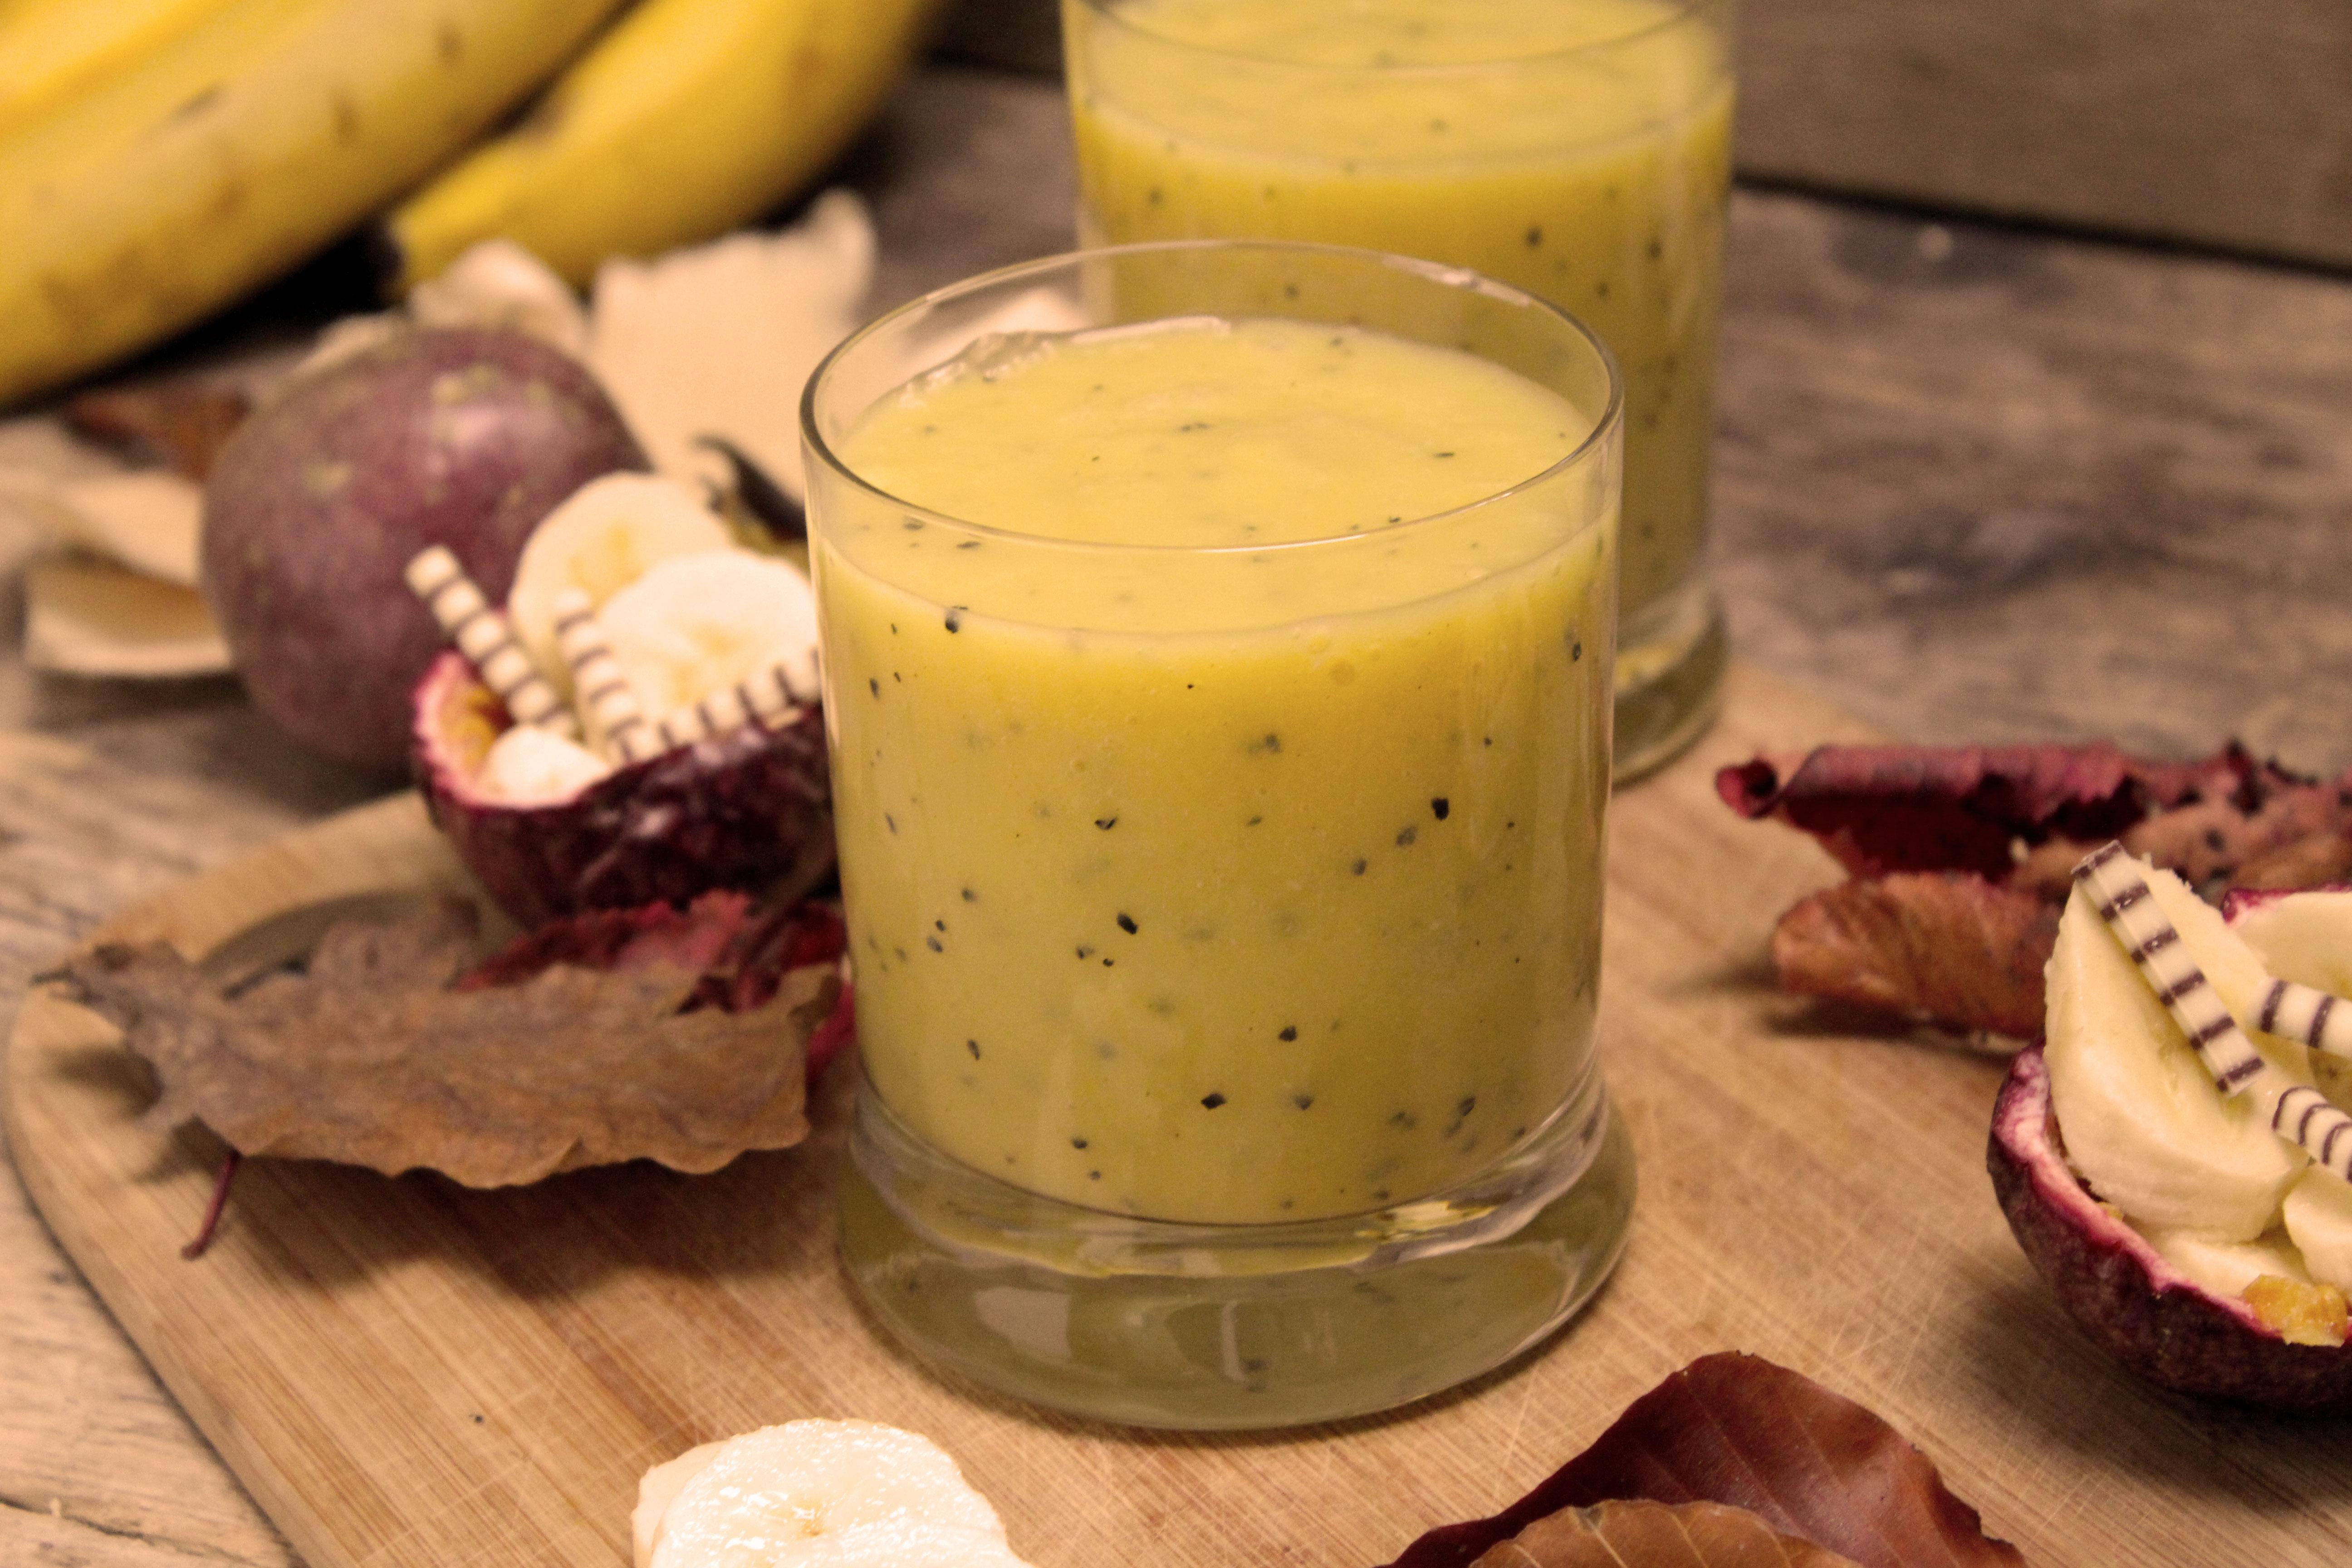 Mango-Maracuja Smoothie